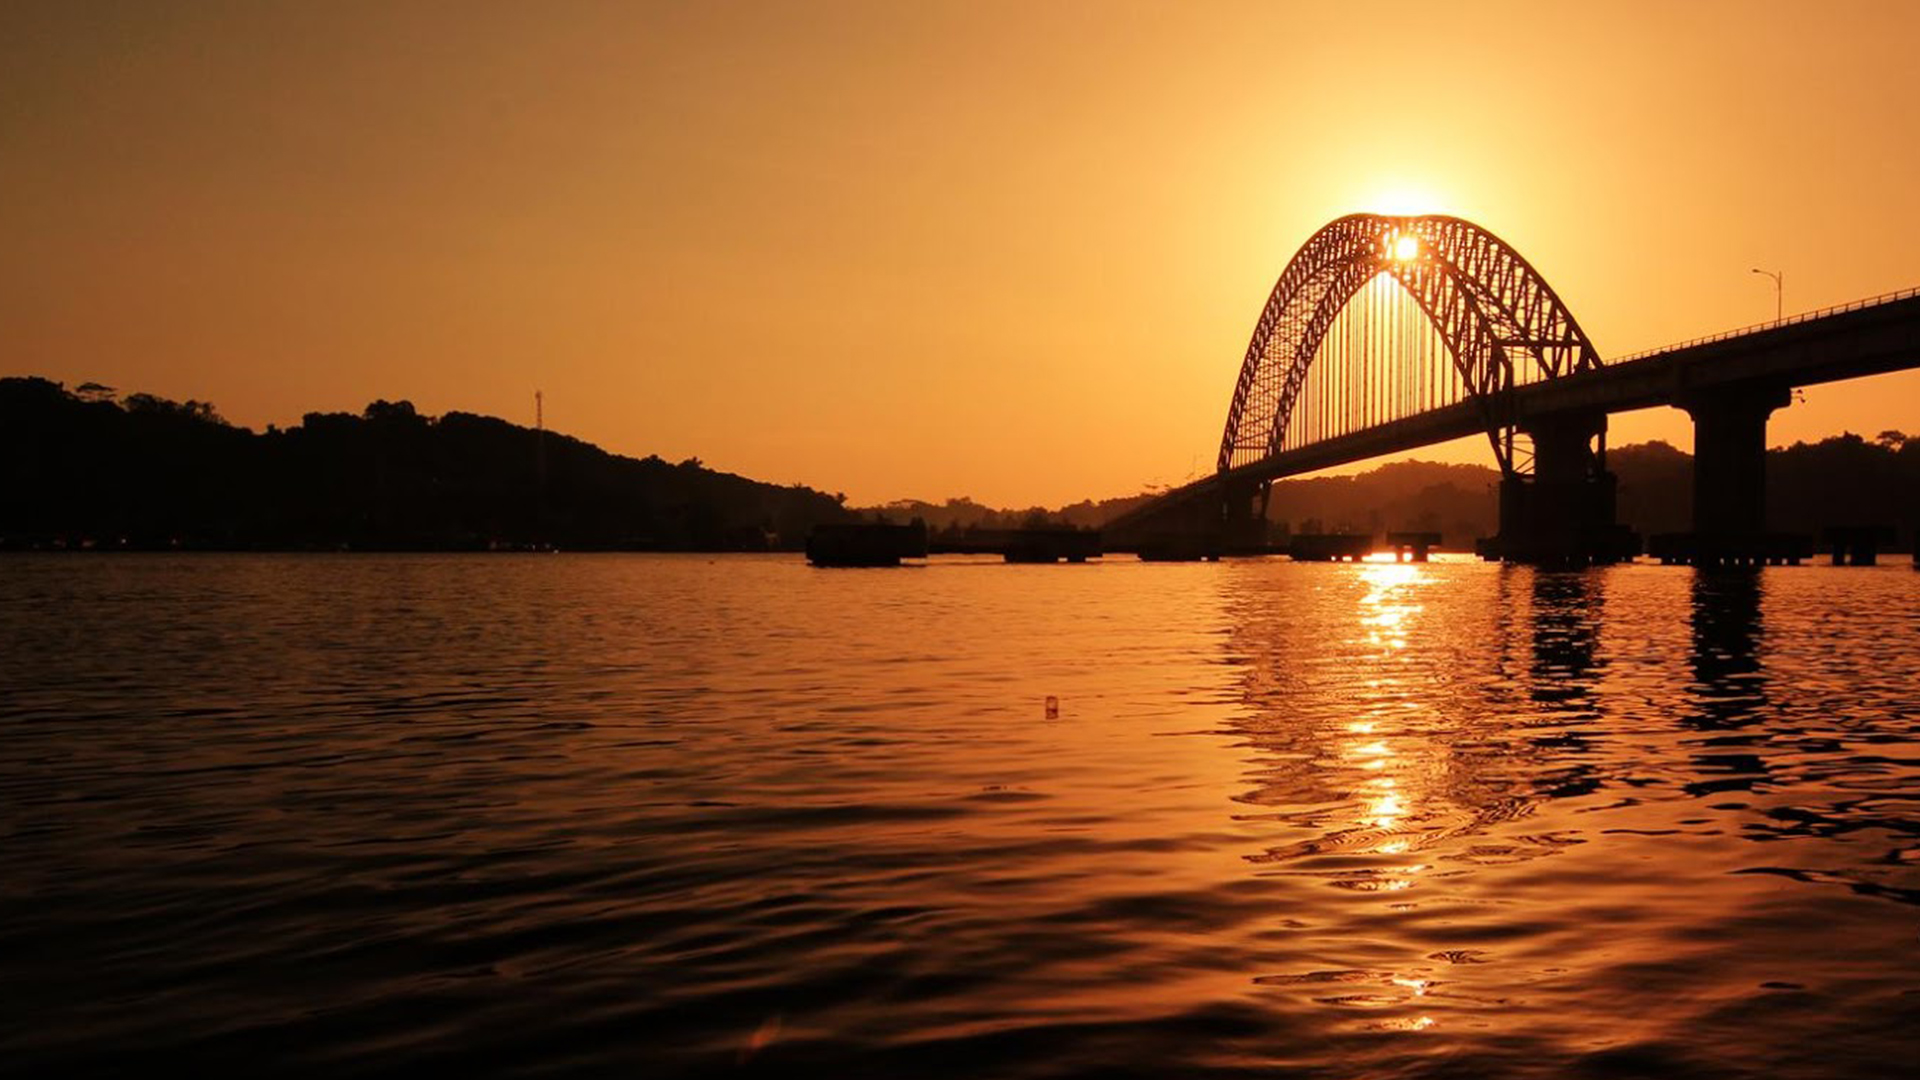 Jembatan Rumpiang saat suasana menuju malam hari | Foto: Aldy Siregar